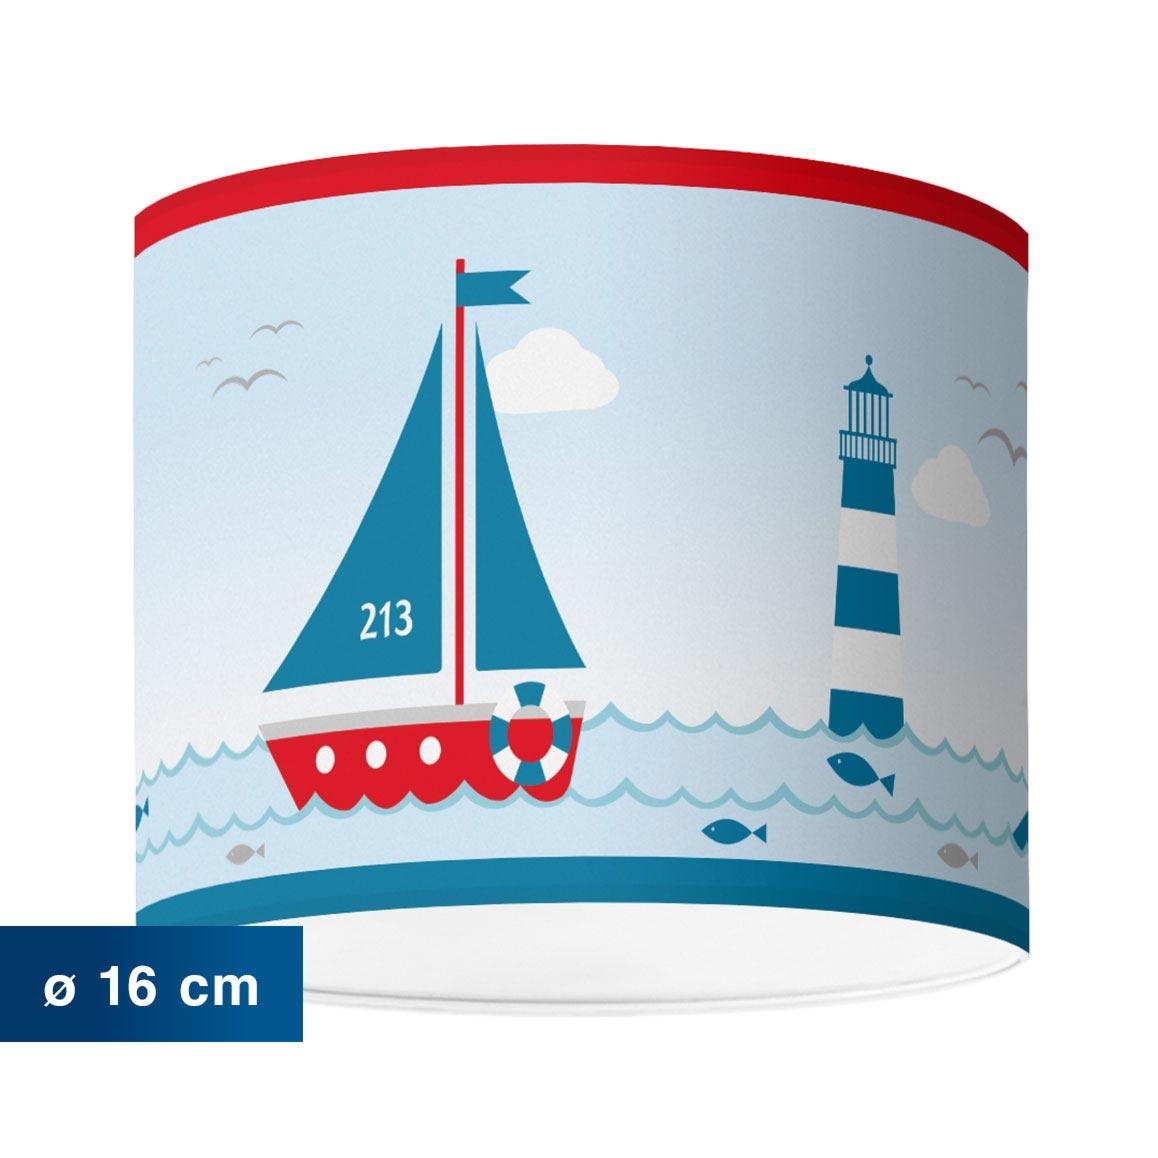 Kinderzimmerlampe im maritimen Design, Sailing Red